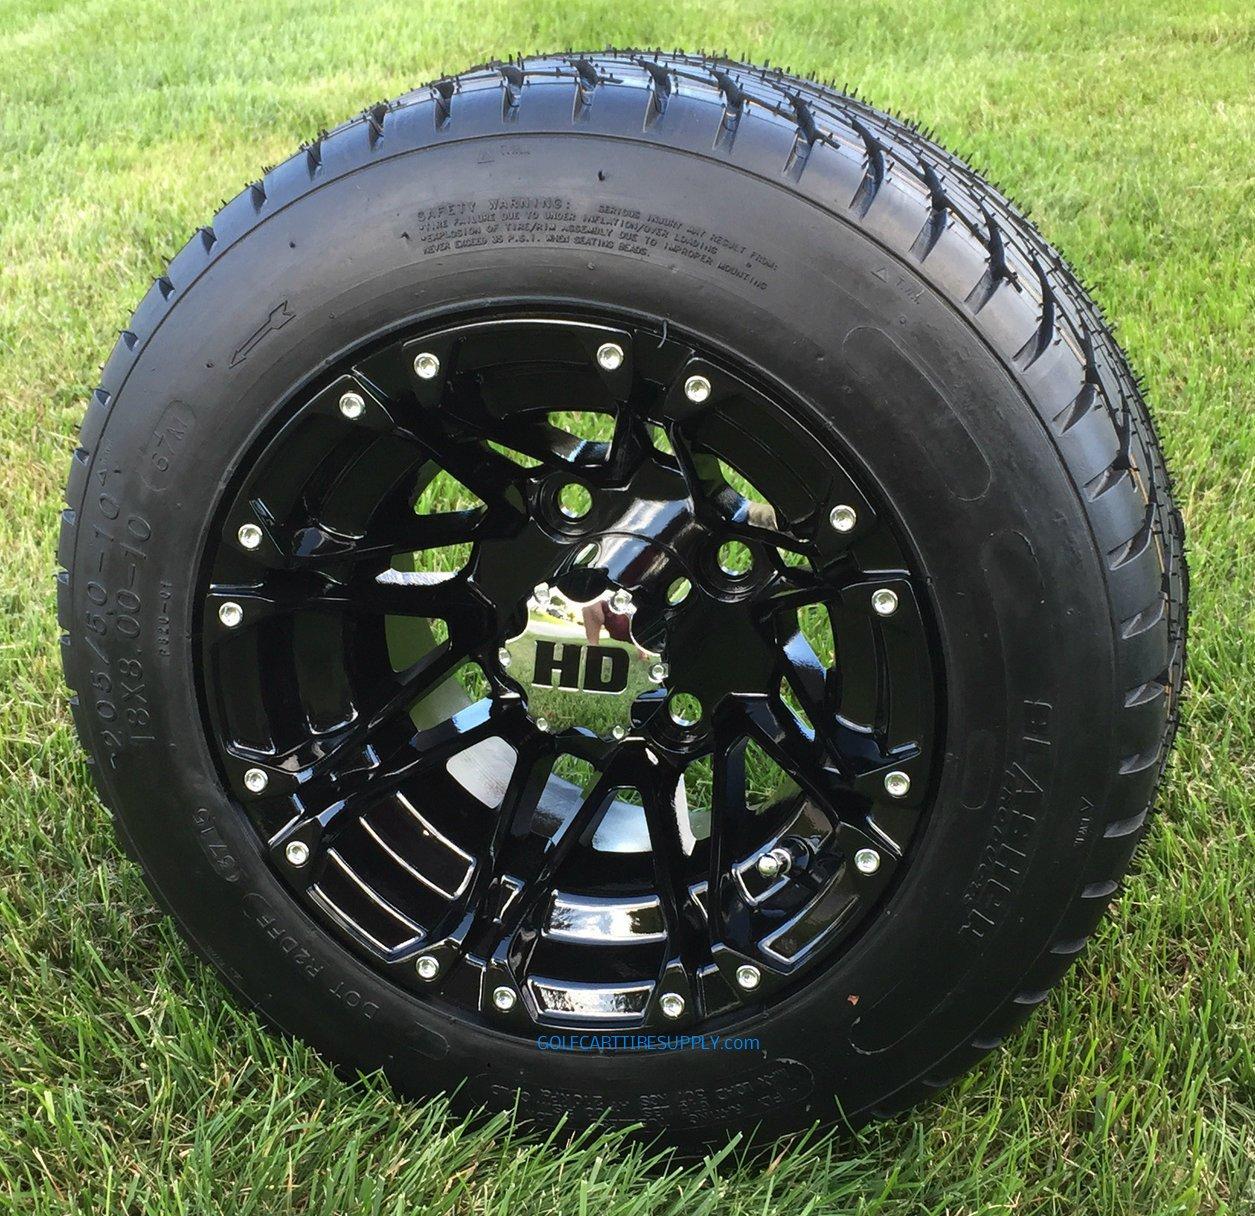 STI HD3 Black 10'' Golf Cart Wheels and Slasher GTX 205/50-10 DOT Golf Cart Tires Combo - Set of 4